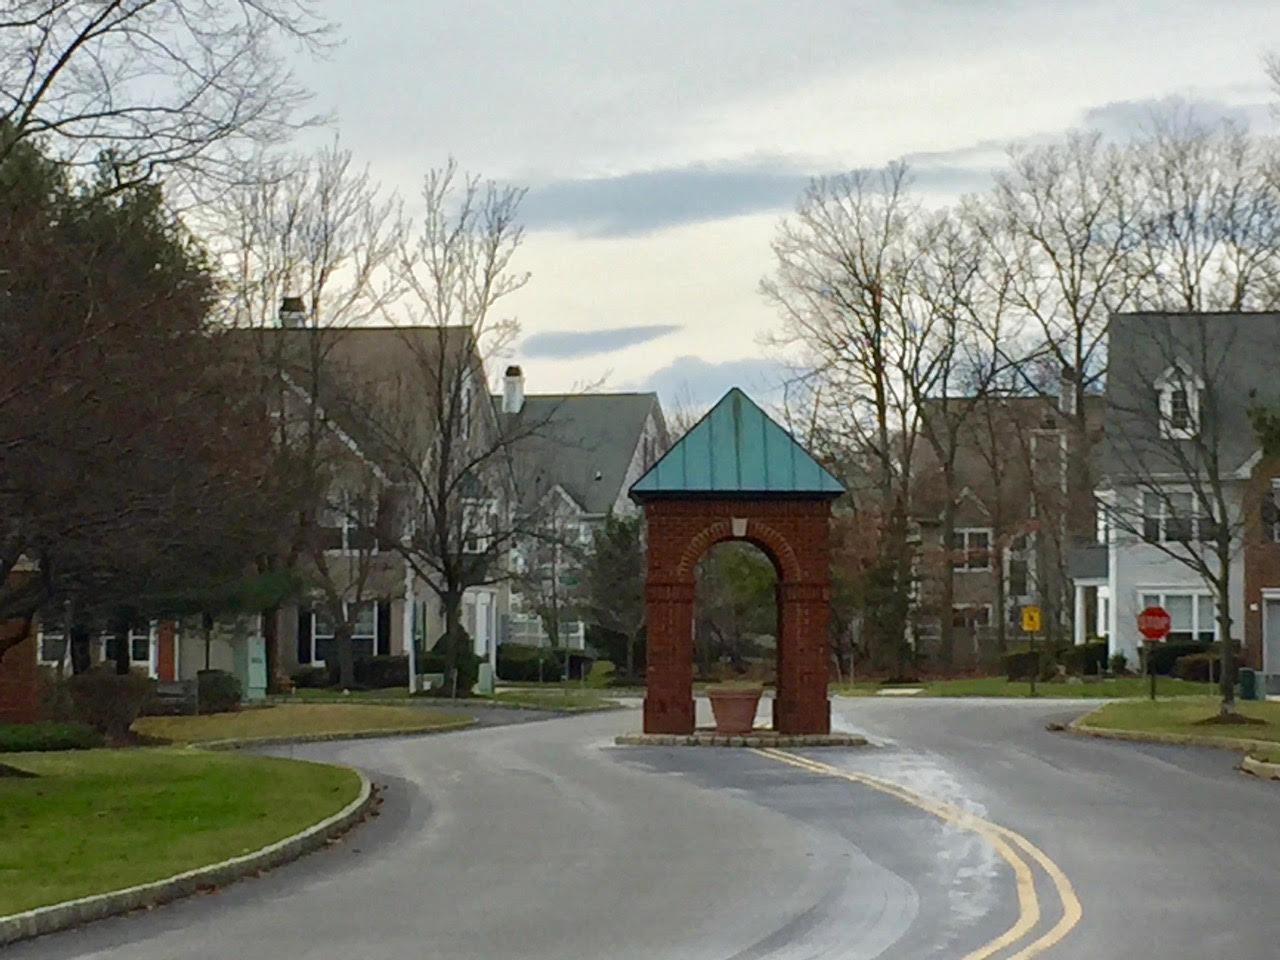 Entrance to Hidden Meadows, a pet friendly community.